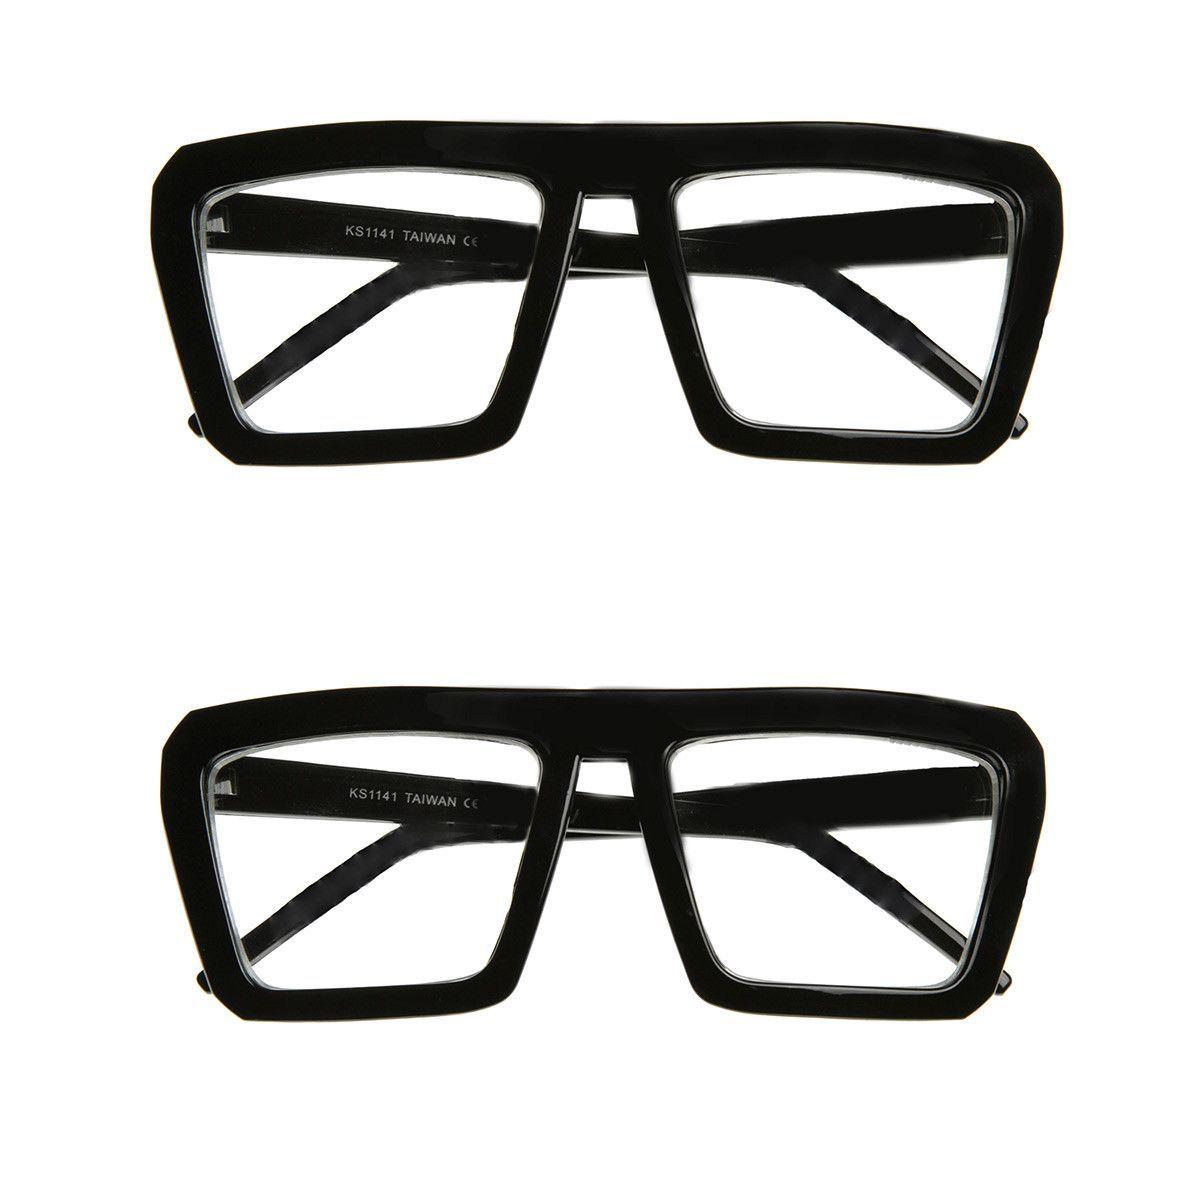 Fashion Frame Flat Top Blaster Frame Horn Rimmed Style Eyewear Clear Lens Glasses